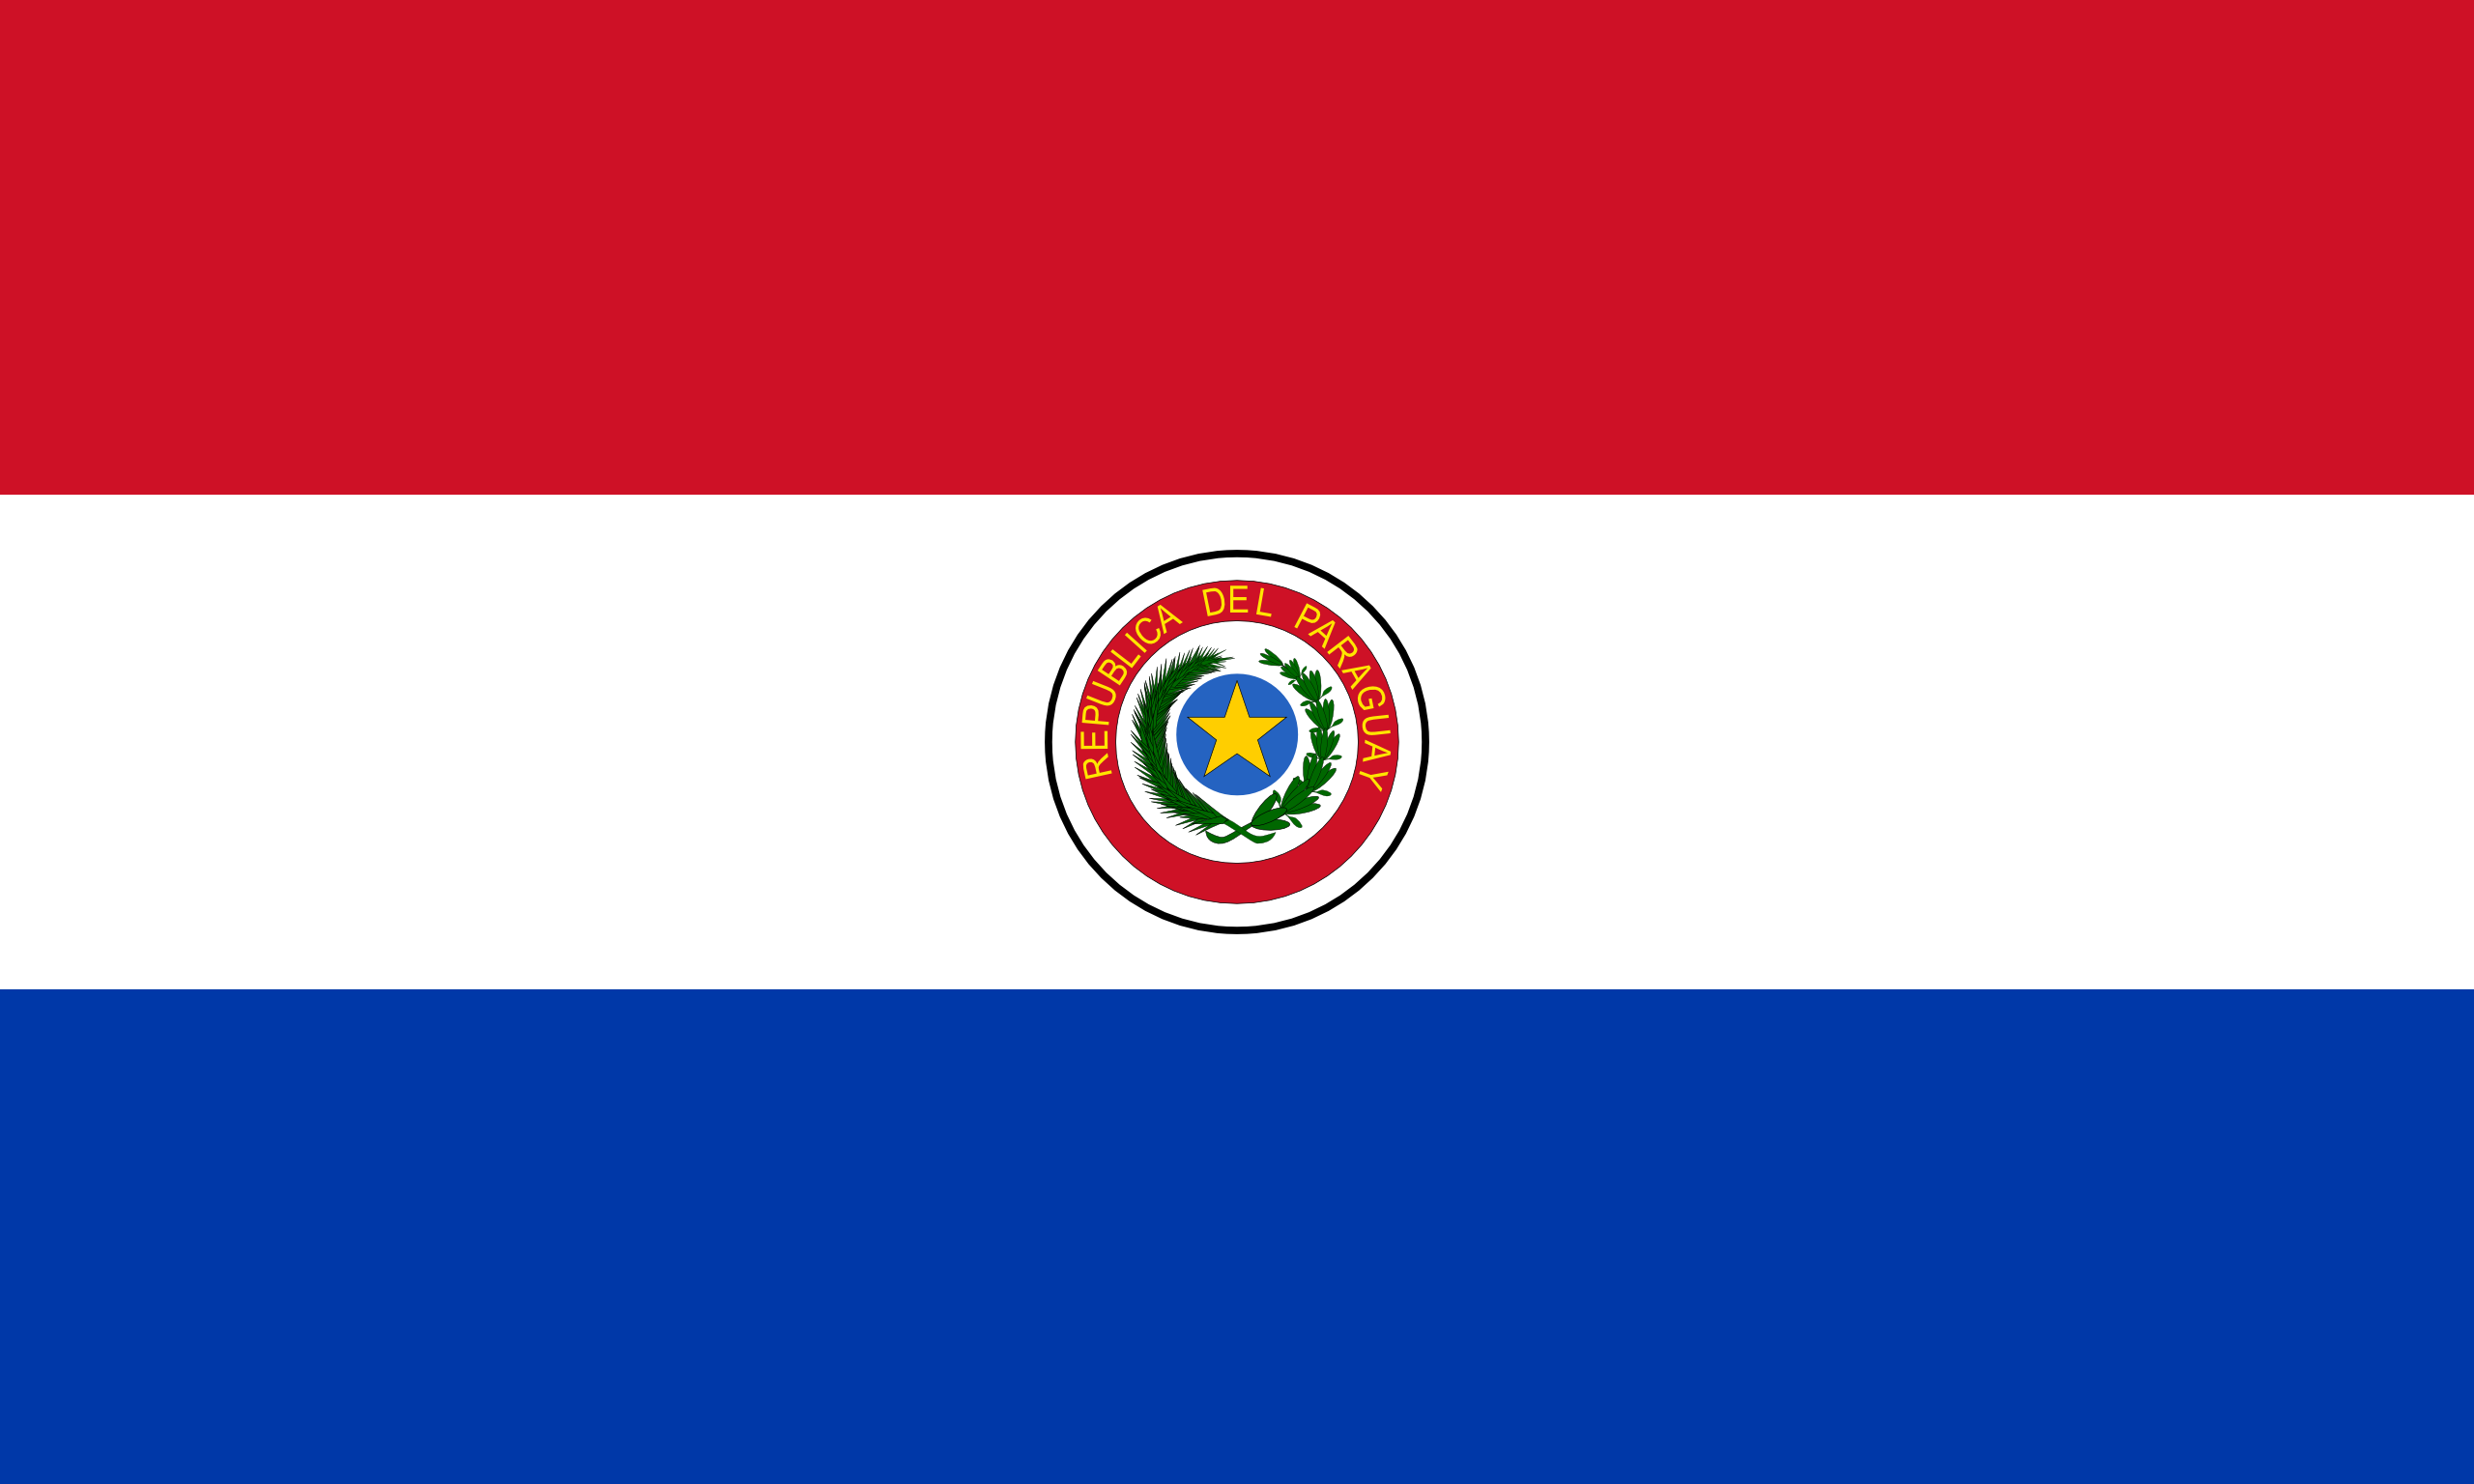 Paraguay, paese, emblema, logo, simbolo - Sfondi HD - Professor-falken.com